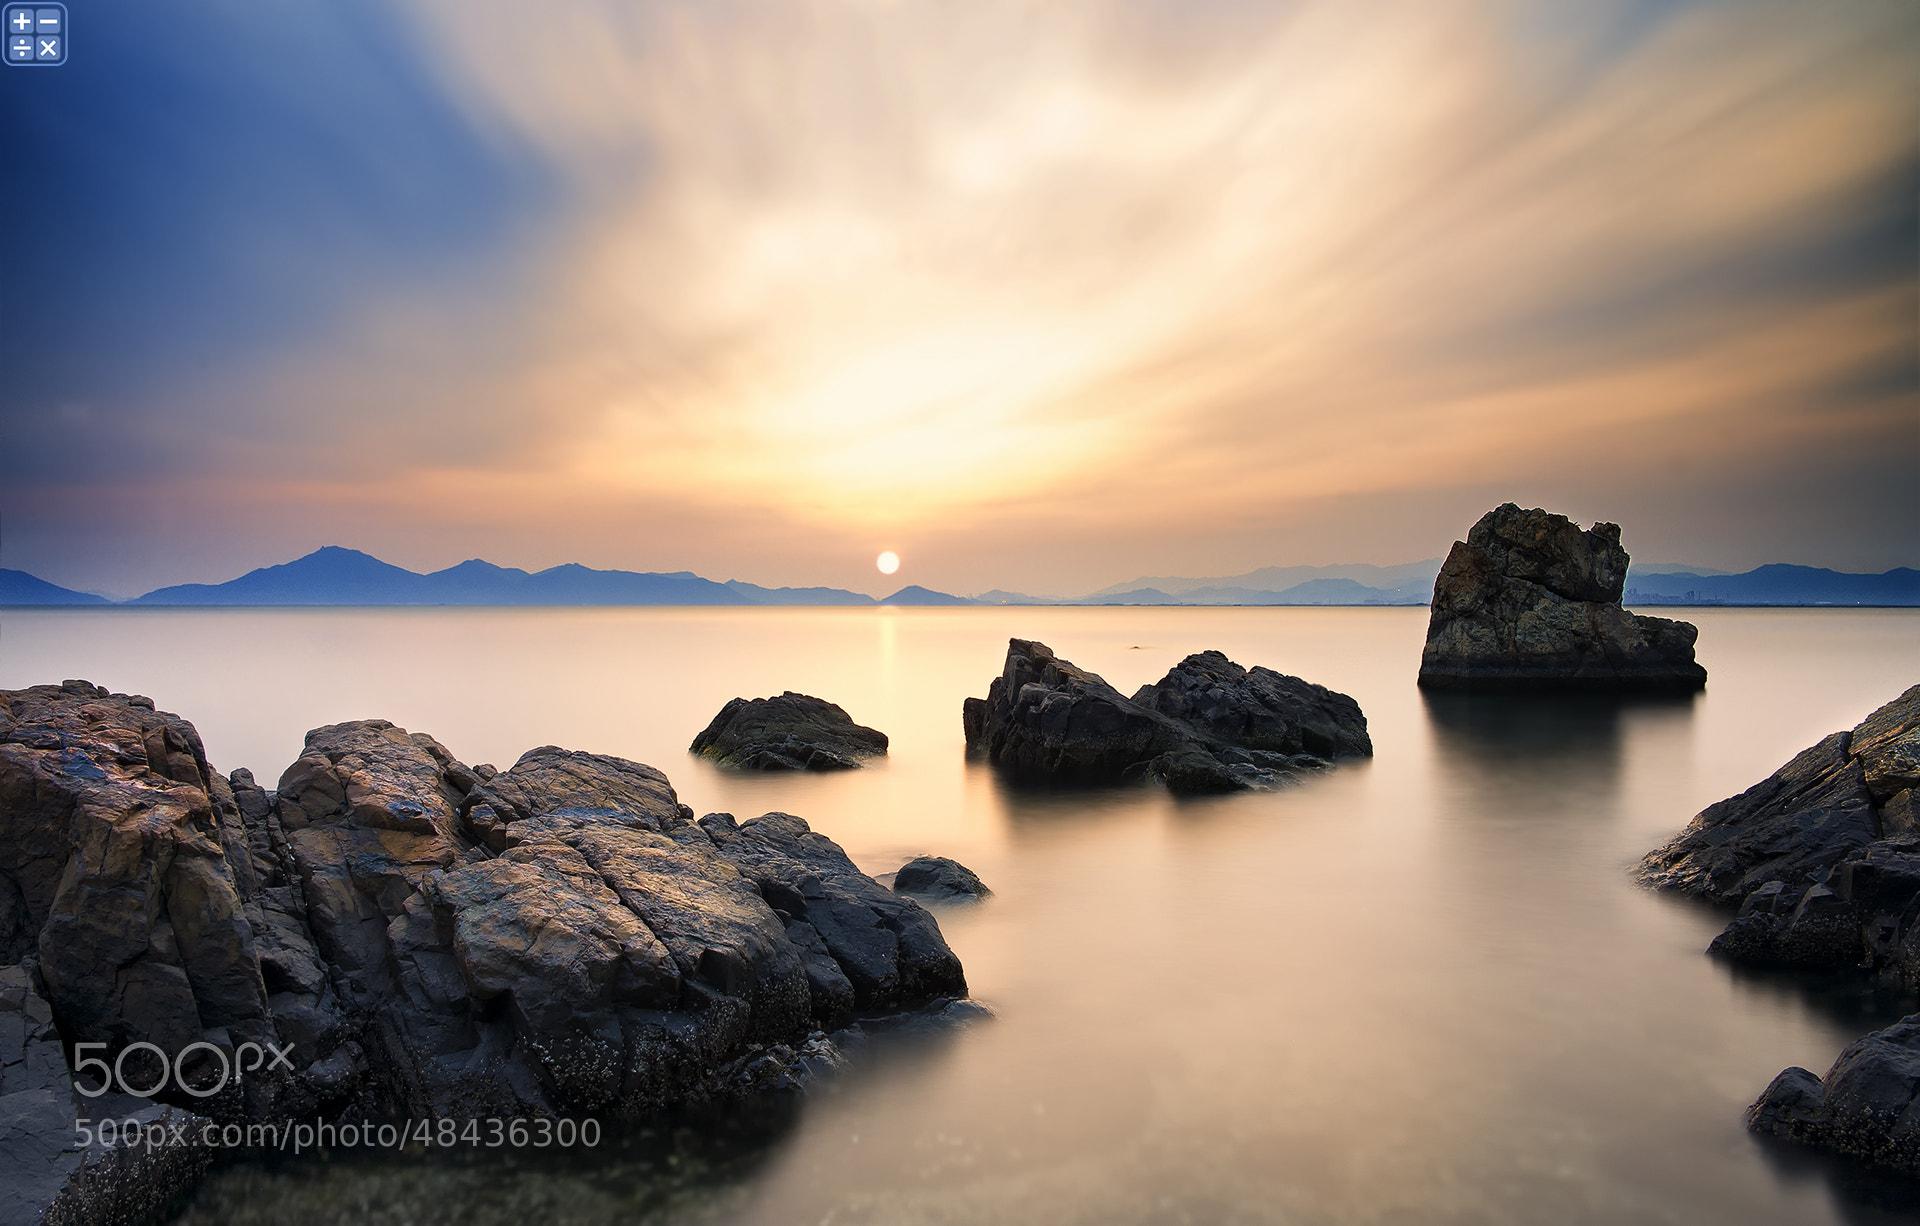 Photograph Silence Sun Set by chan-wook Kim on 500px